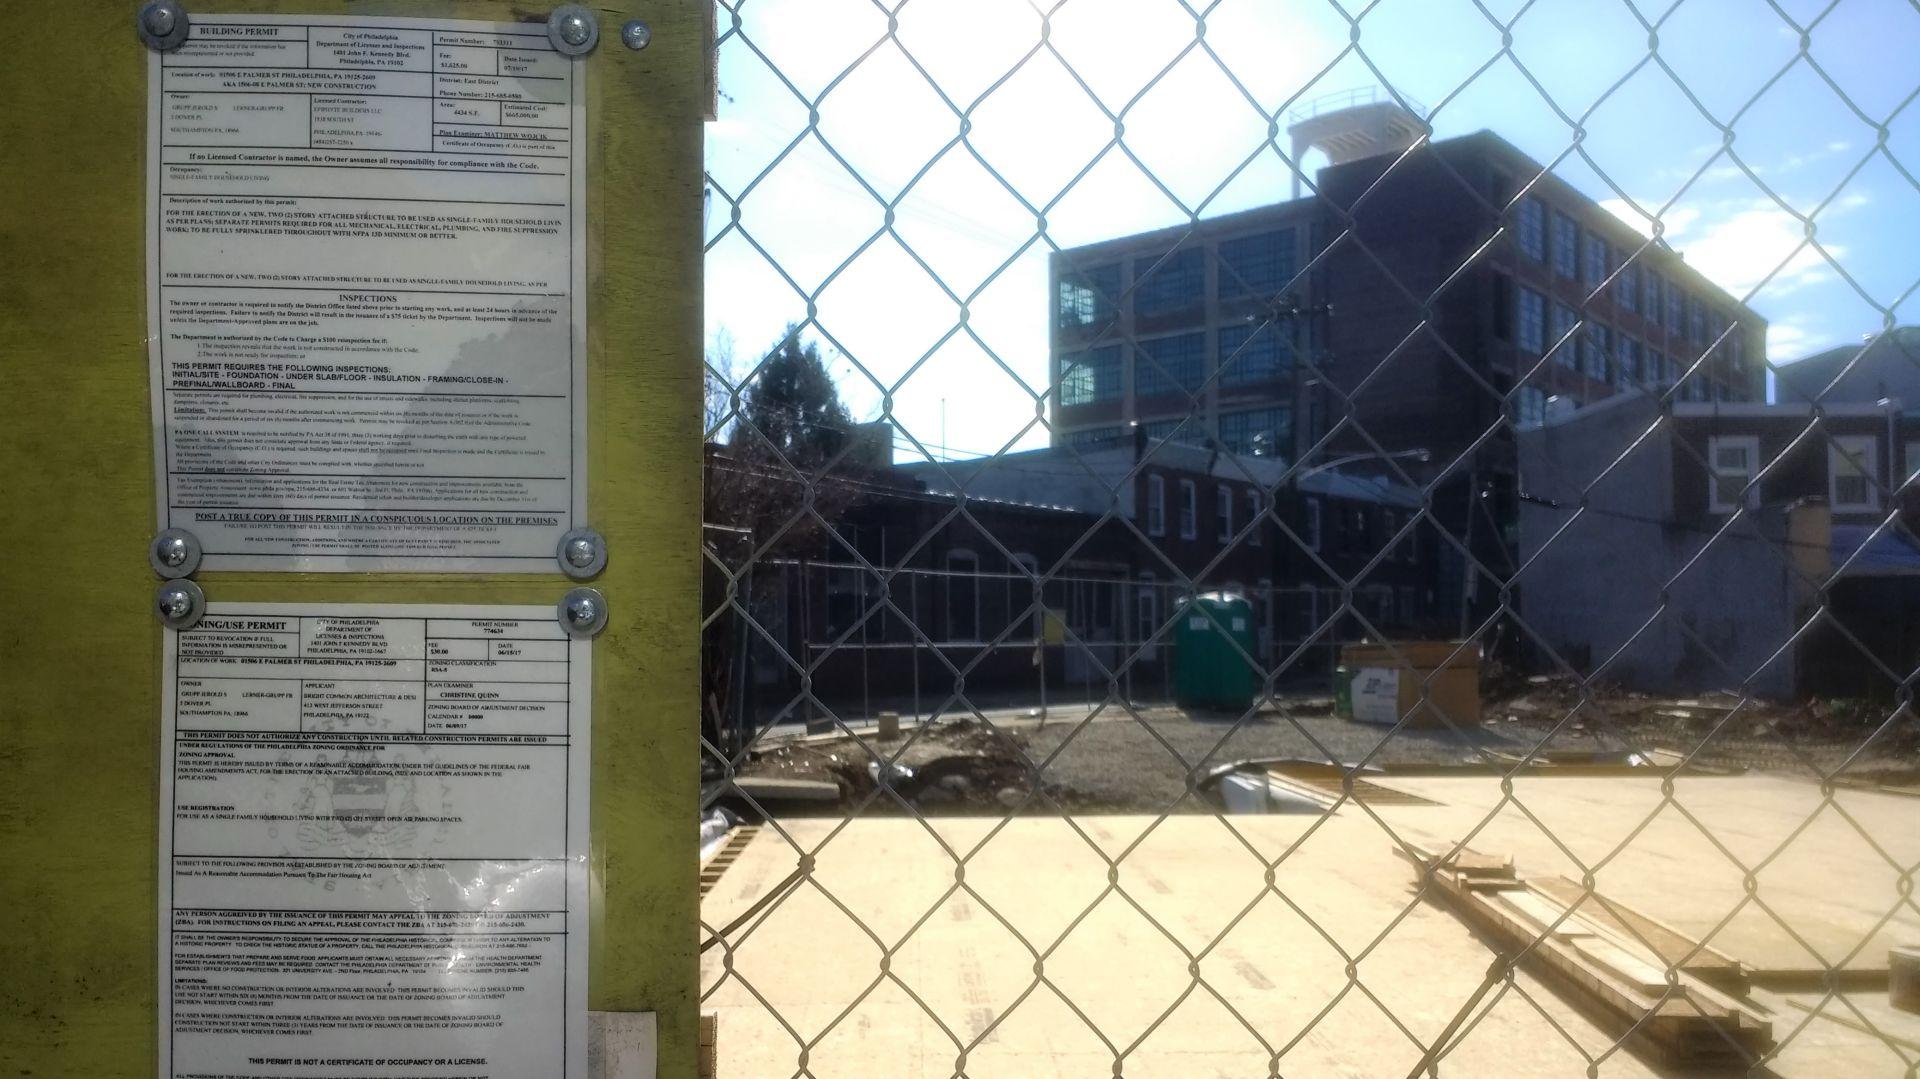 Industrial zoning in Philadelphia